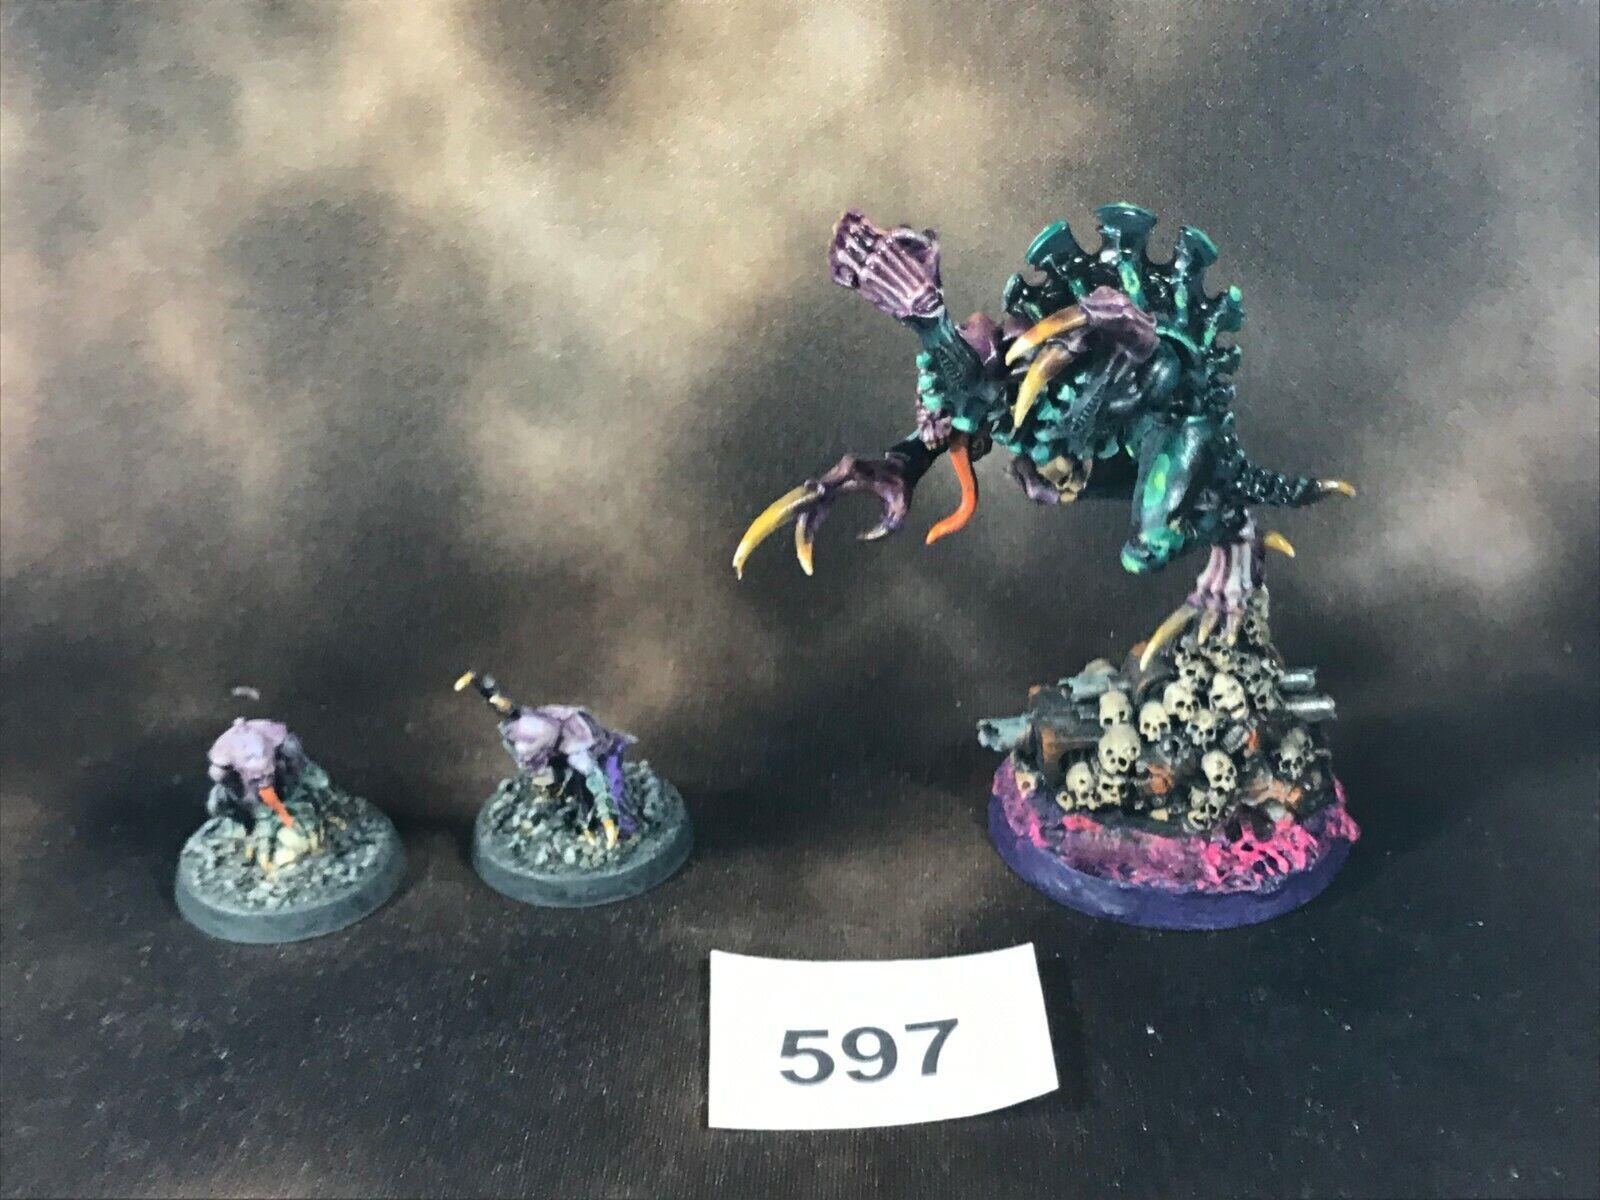 Warhammer 40k Tyranids  Genestealer Cult Patriarch Familiars Broodlord Painted  vendita all'ingrosso